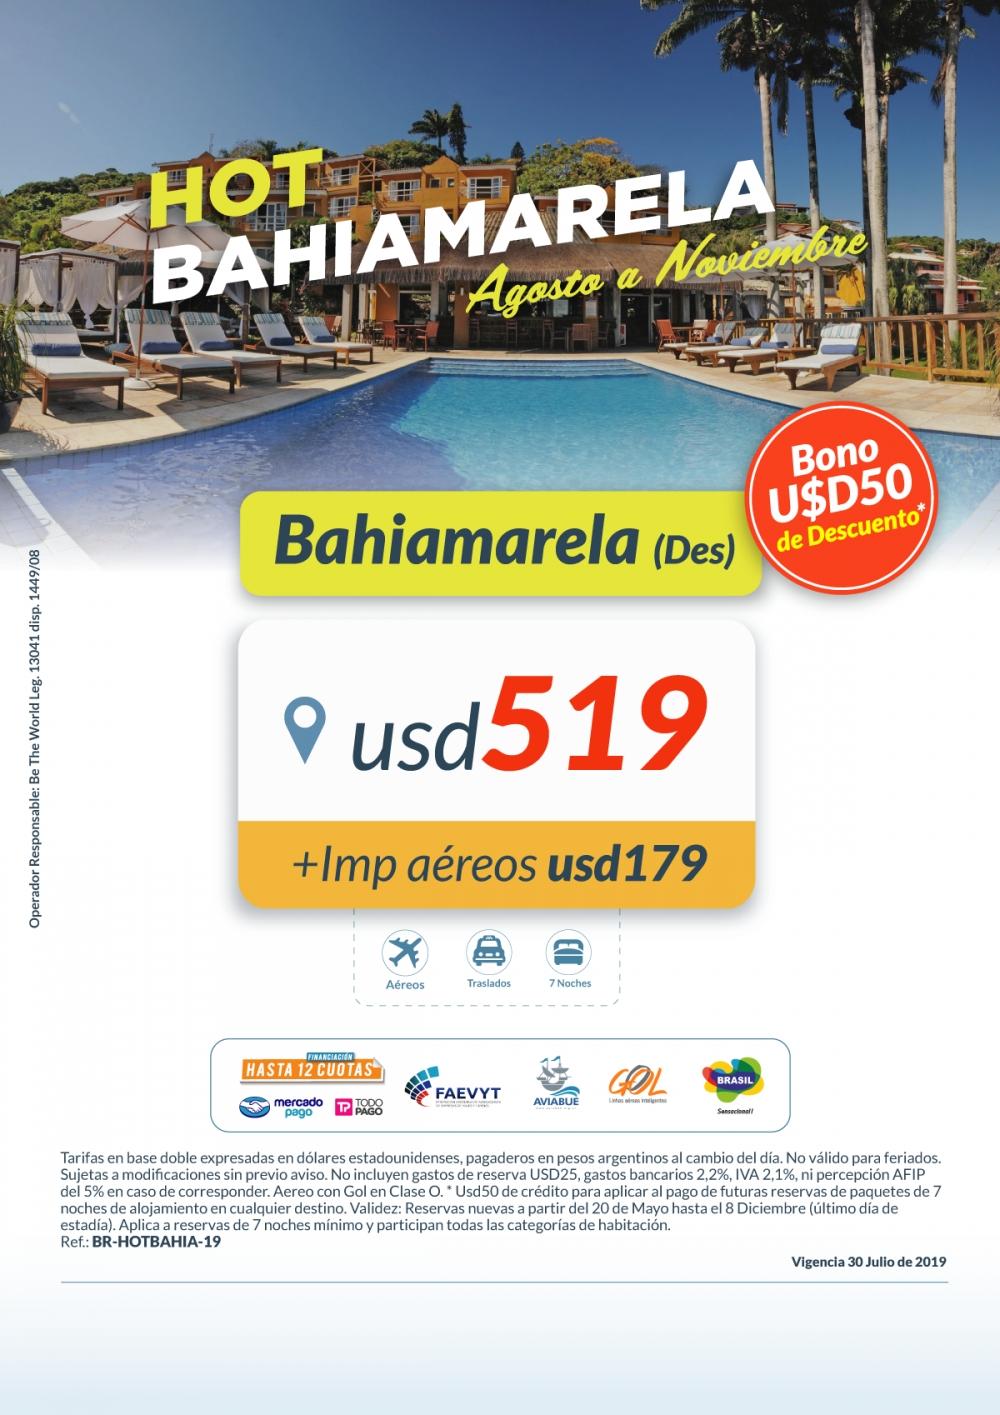 OFERTA - Hotel Bahiamarela - Salidas Agosto a Noviembre